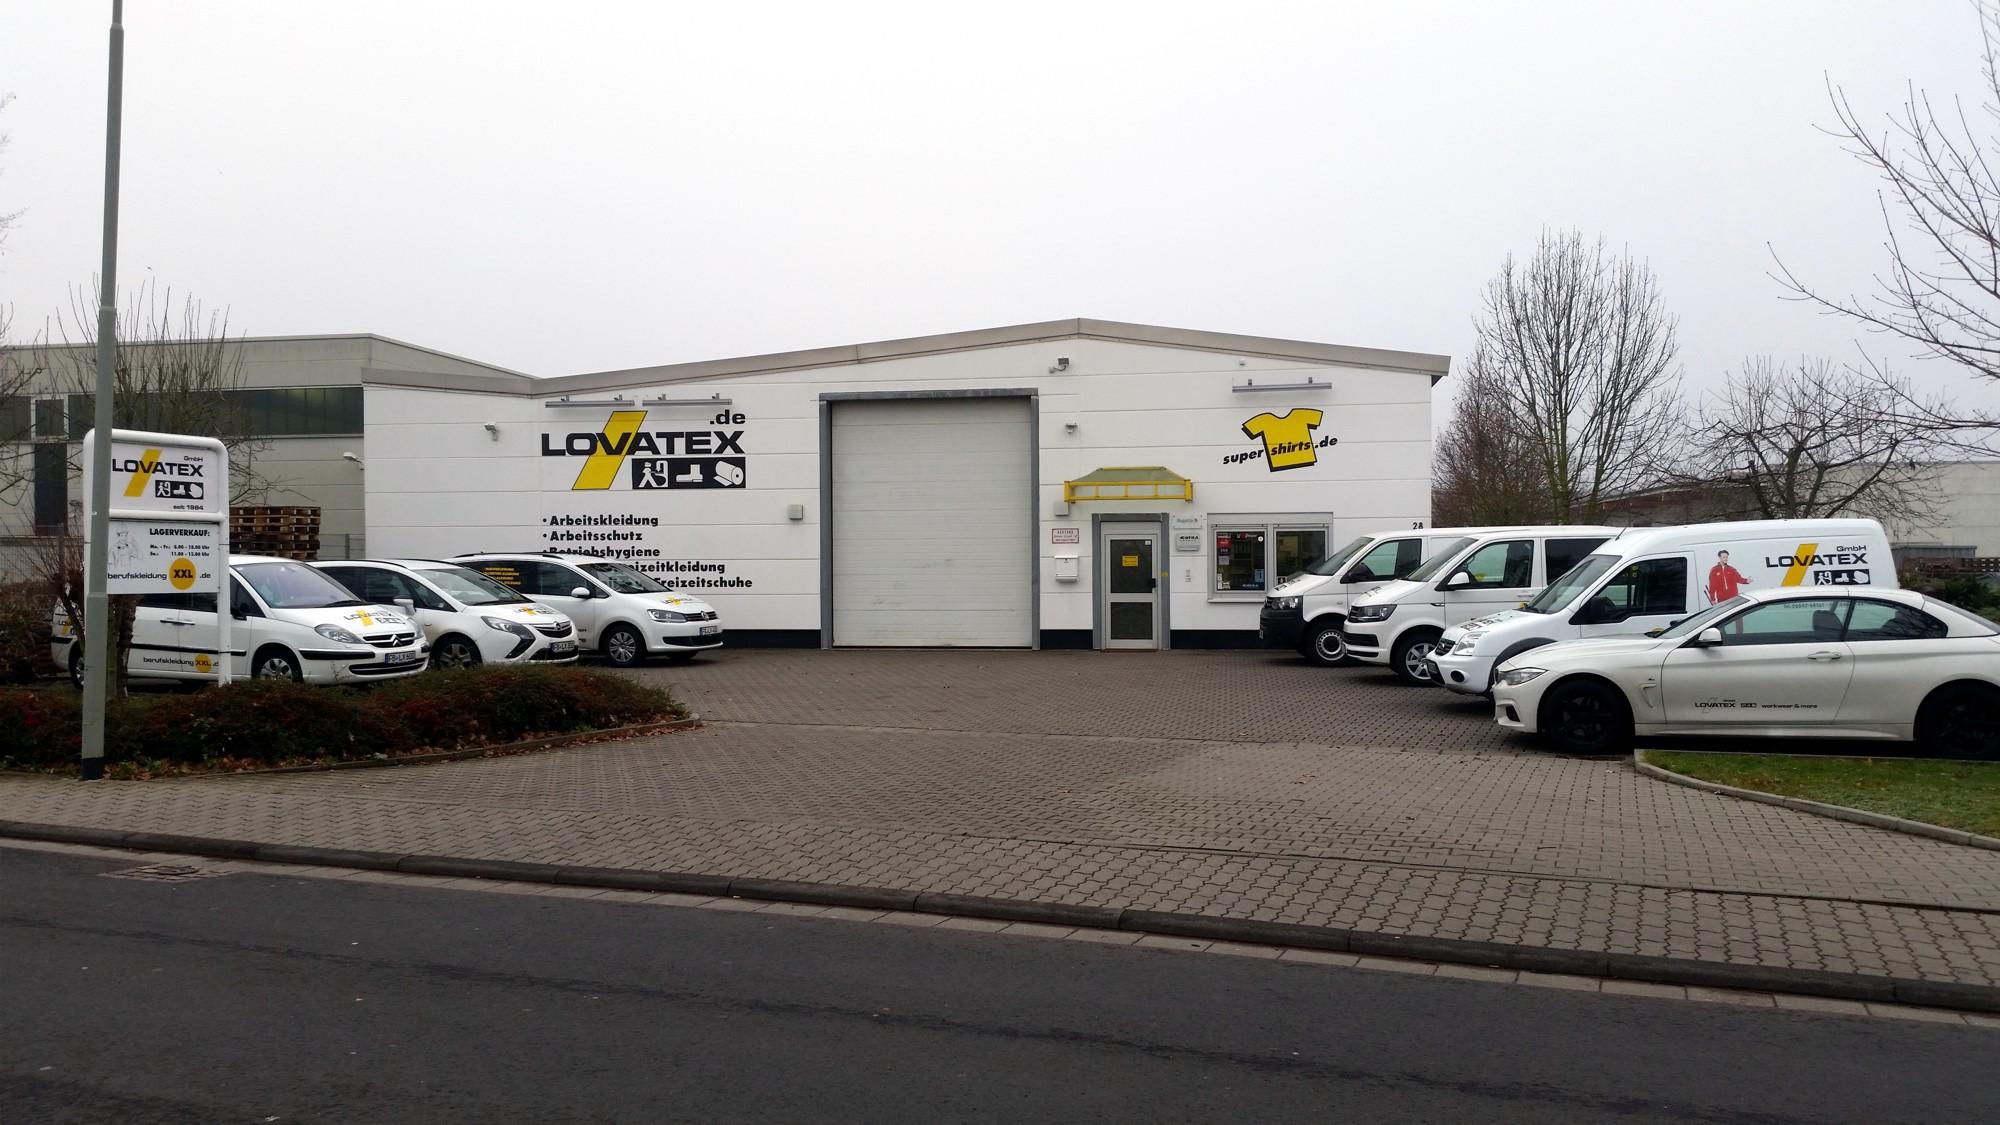 Lovatex GmbH